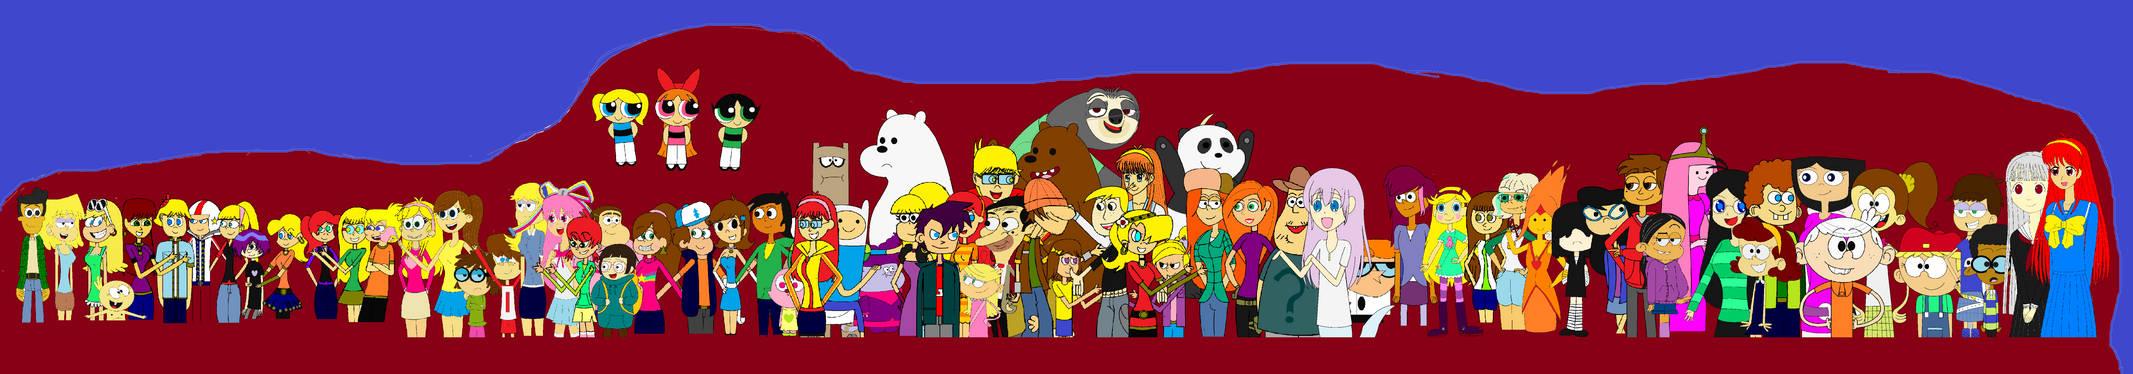 Gather Up! Cartoon's Representatives!!